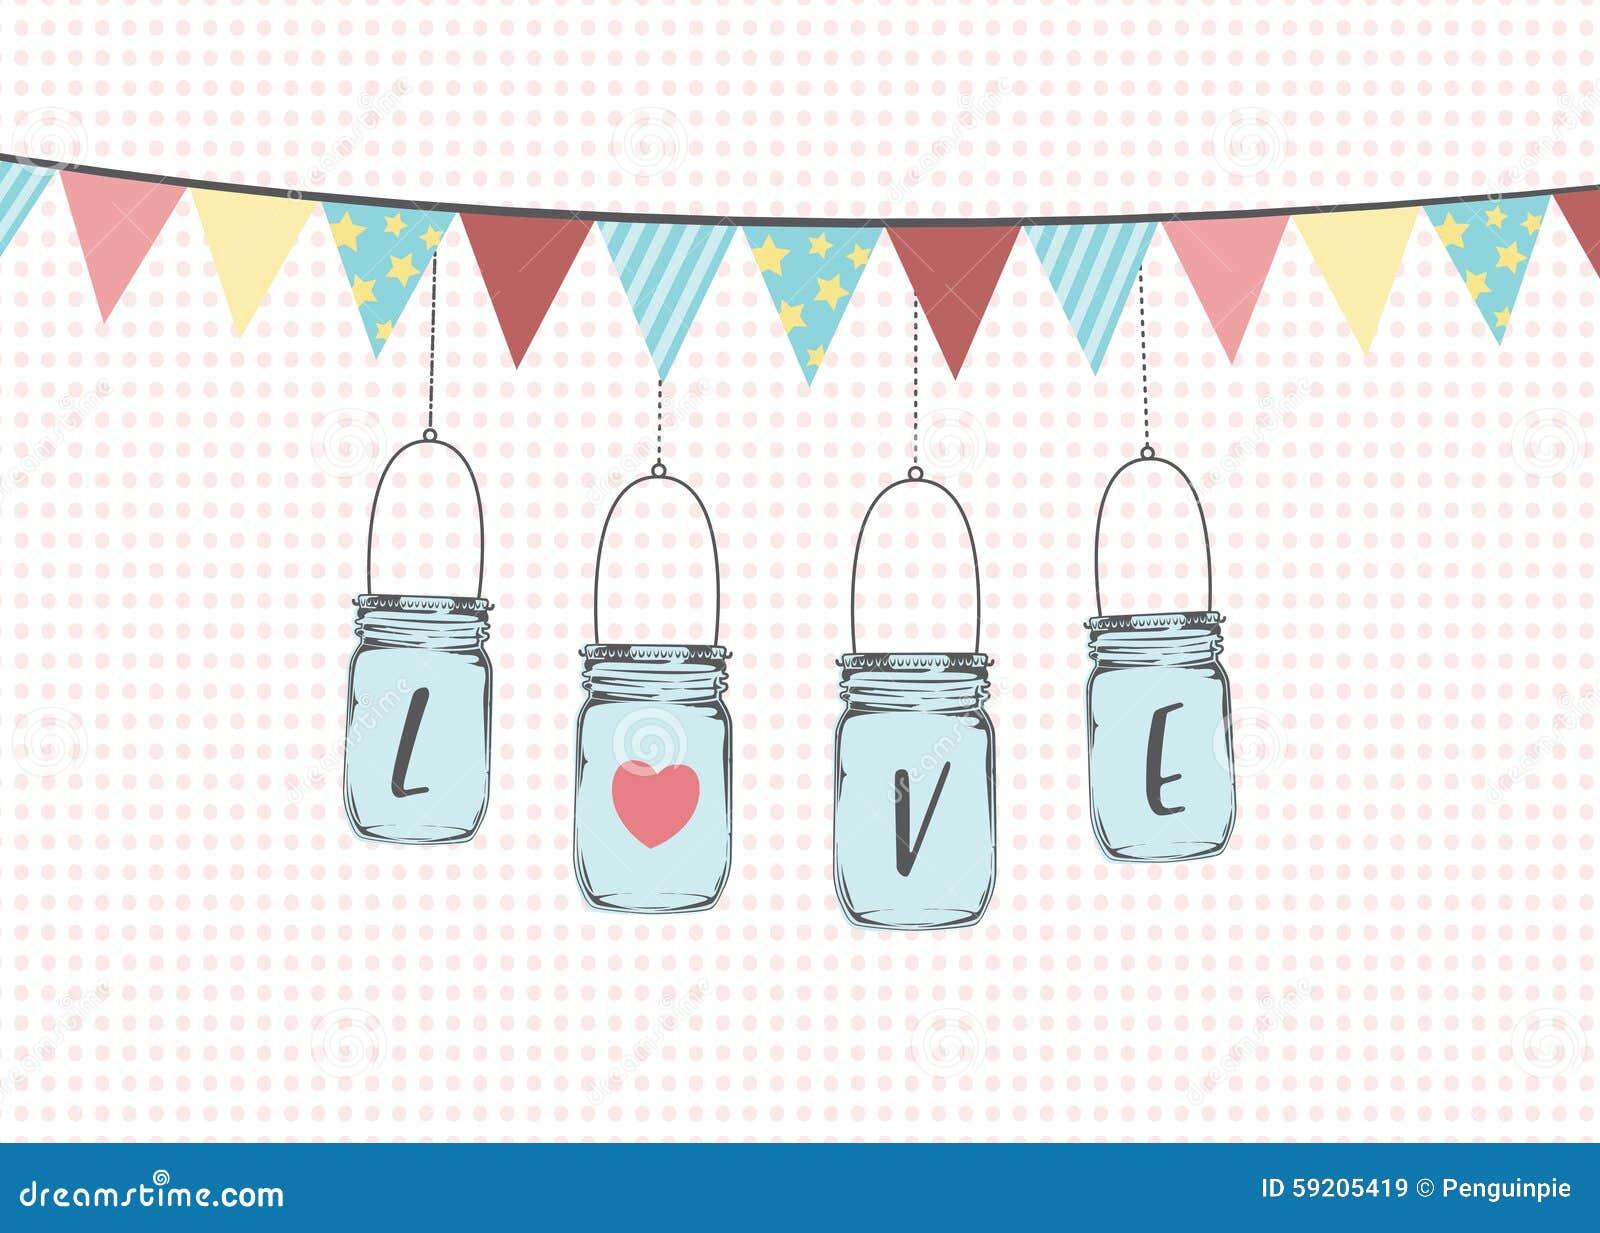 Vector Illustration Of Hanging Mason Jars